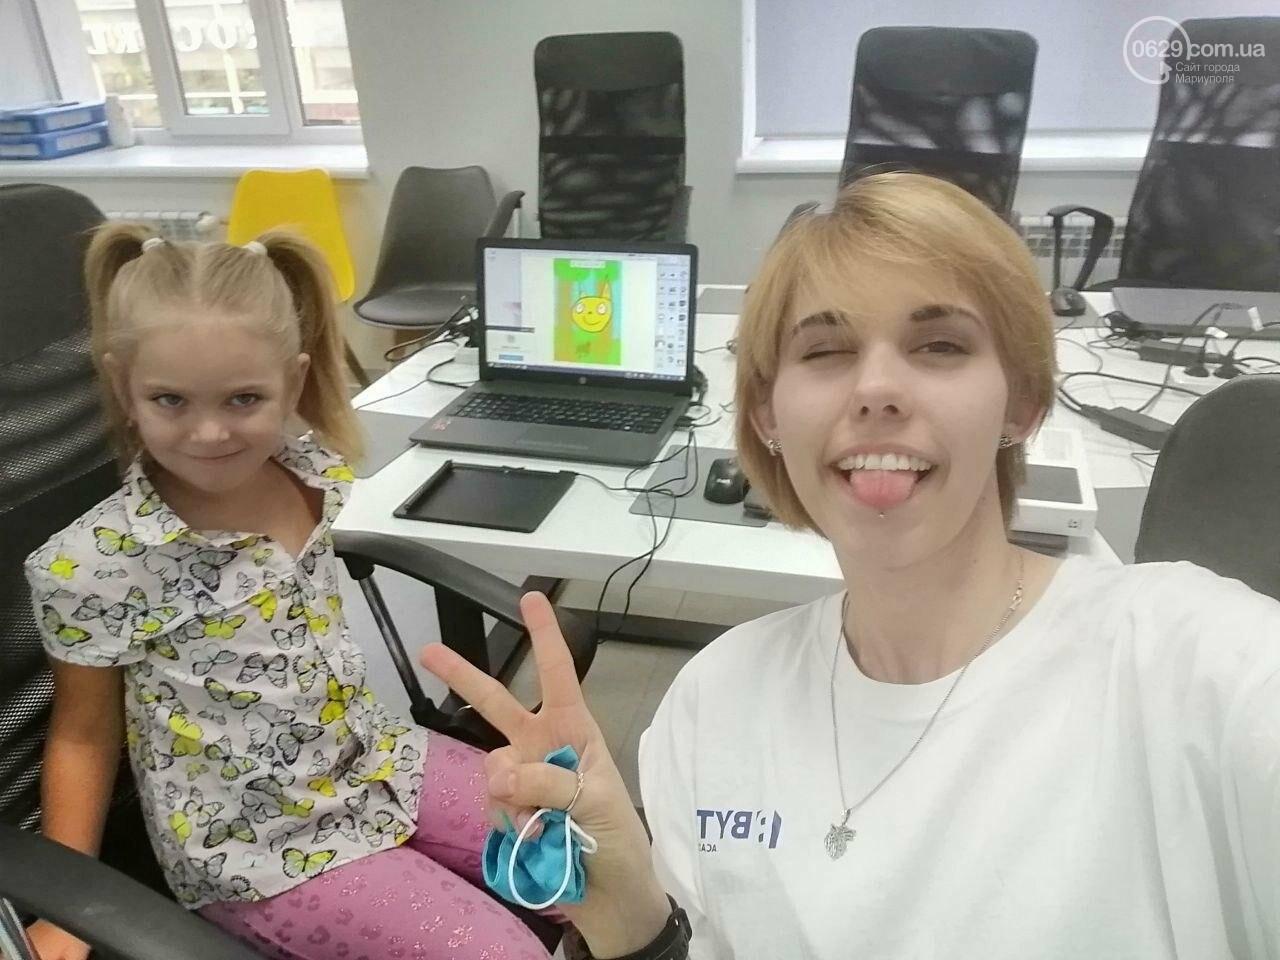 Не нужно ждать! Запиши ребенка на пробное занятие от IT-академии BYTE!, фото-1